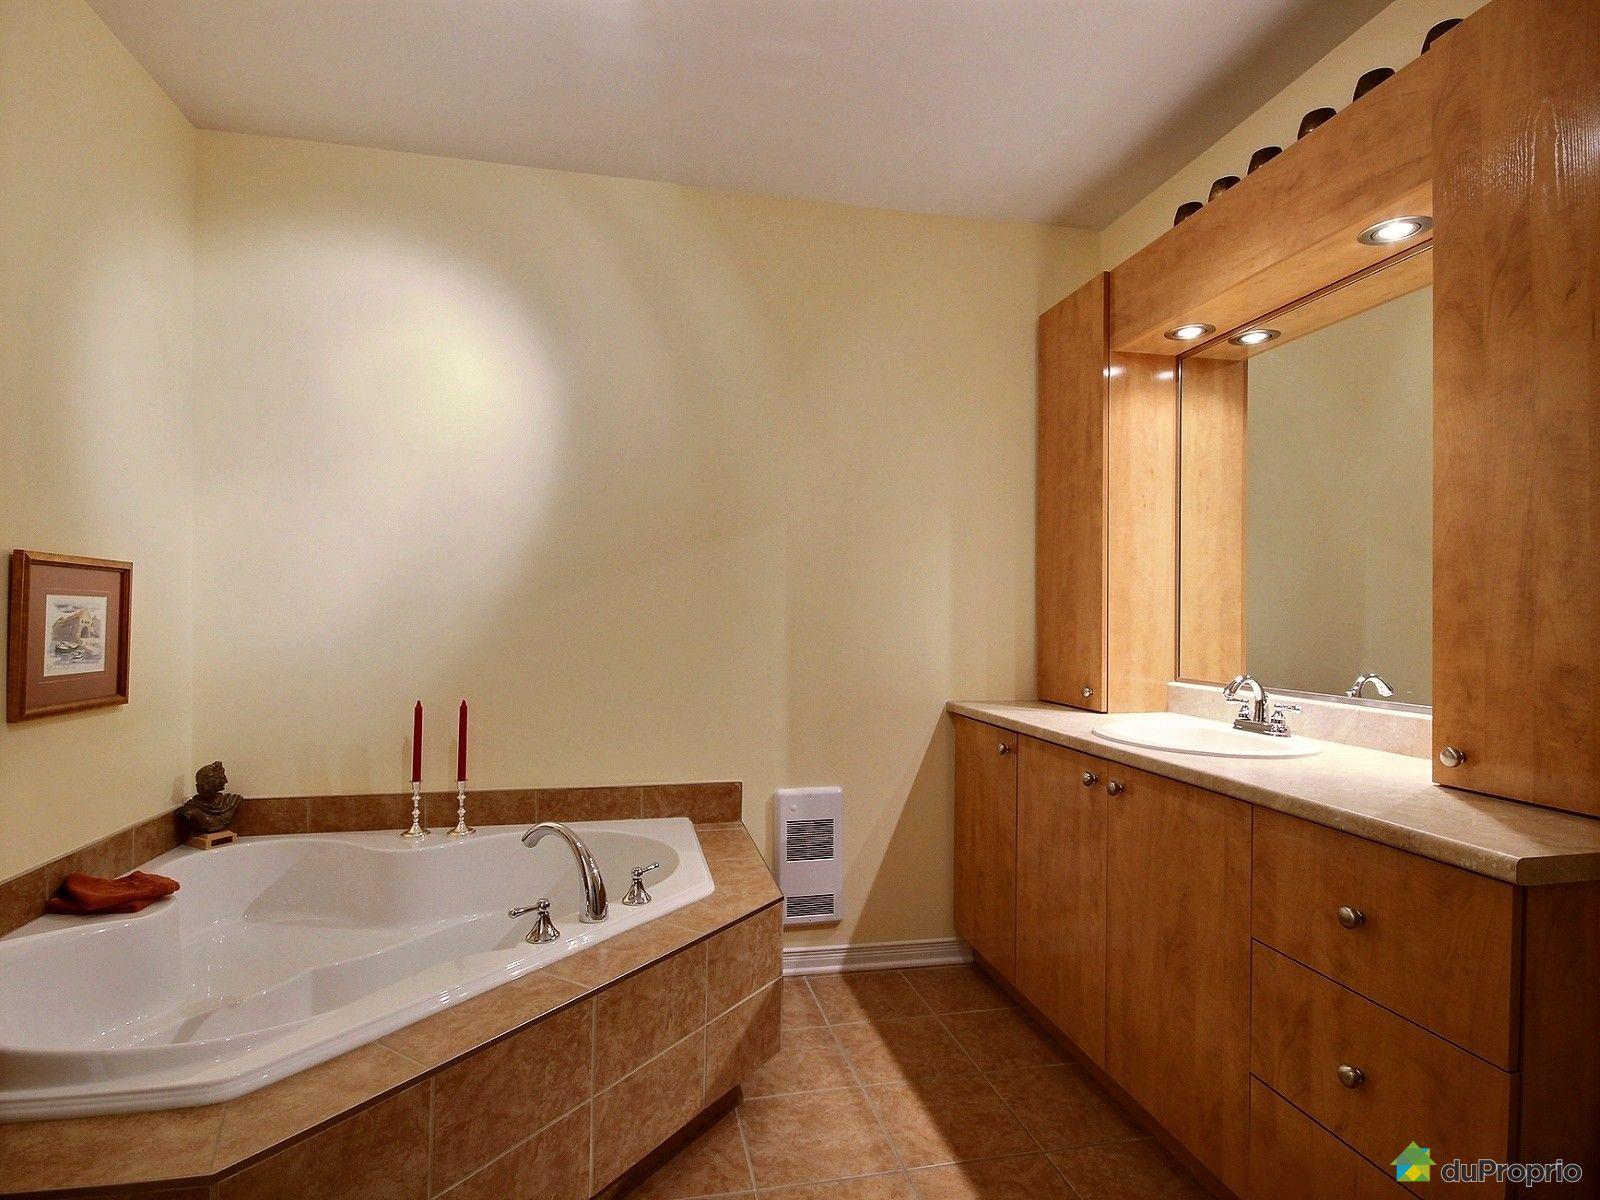 Condo vendre st eustache 5 145 boulevard binette for Salle de bain 25 st eustache